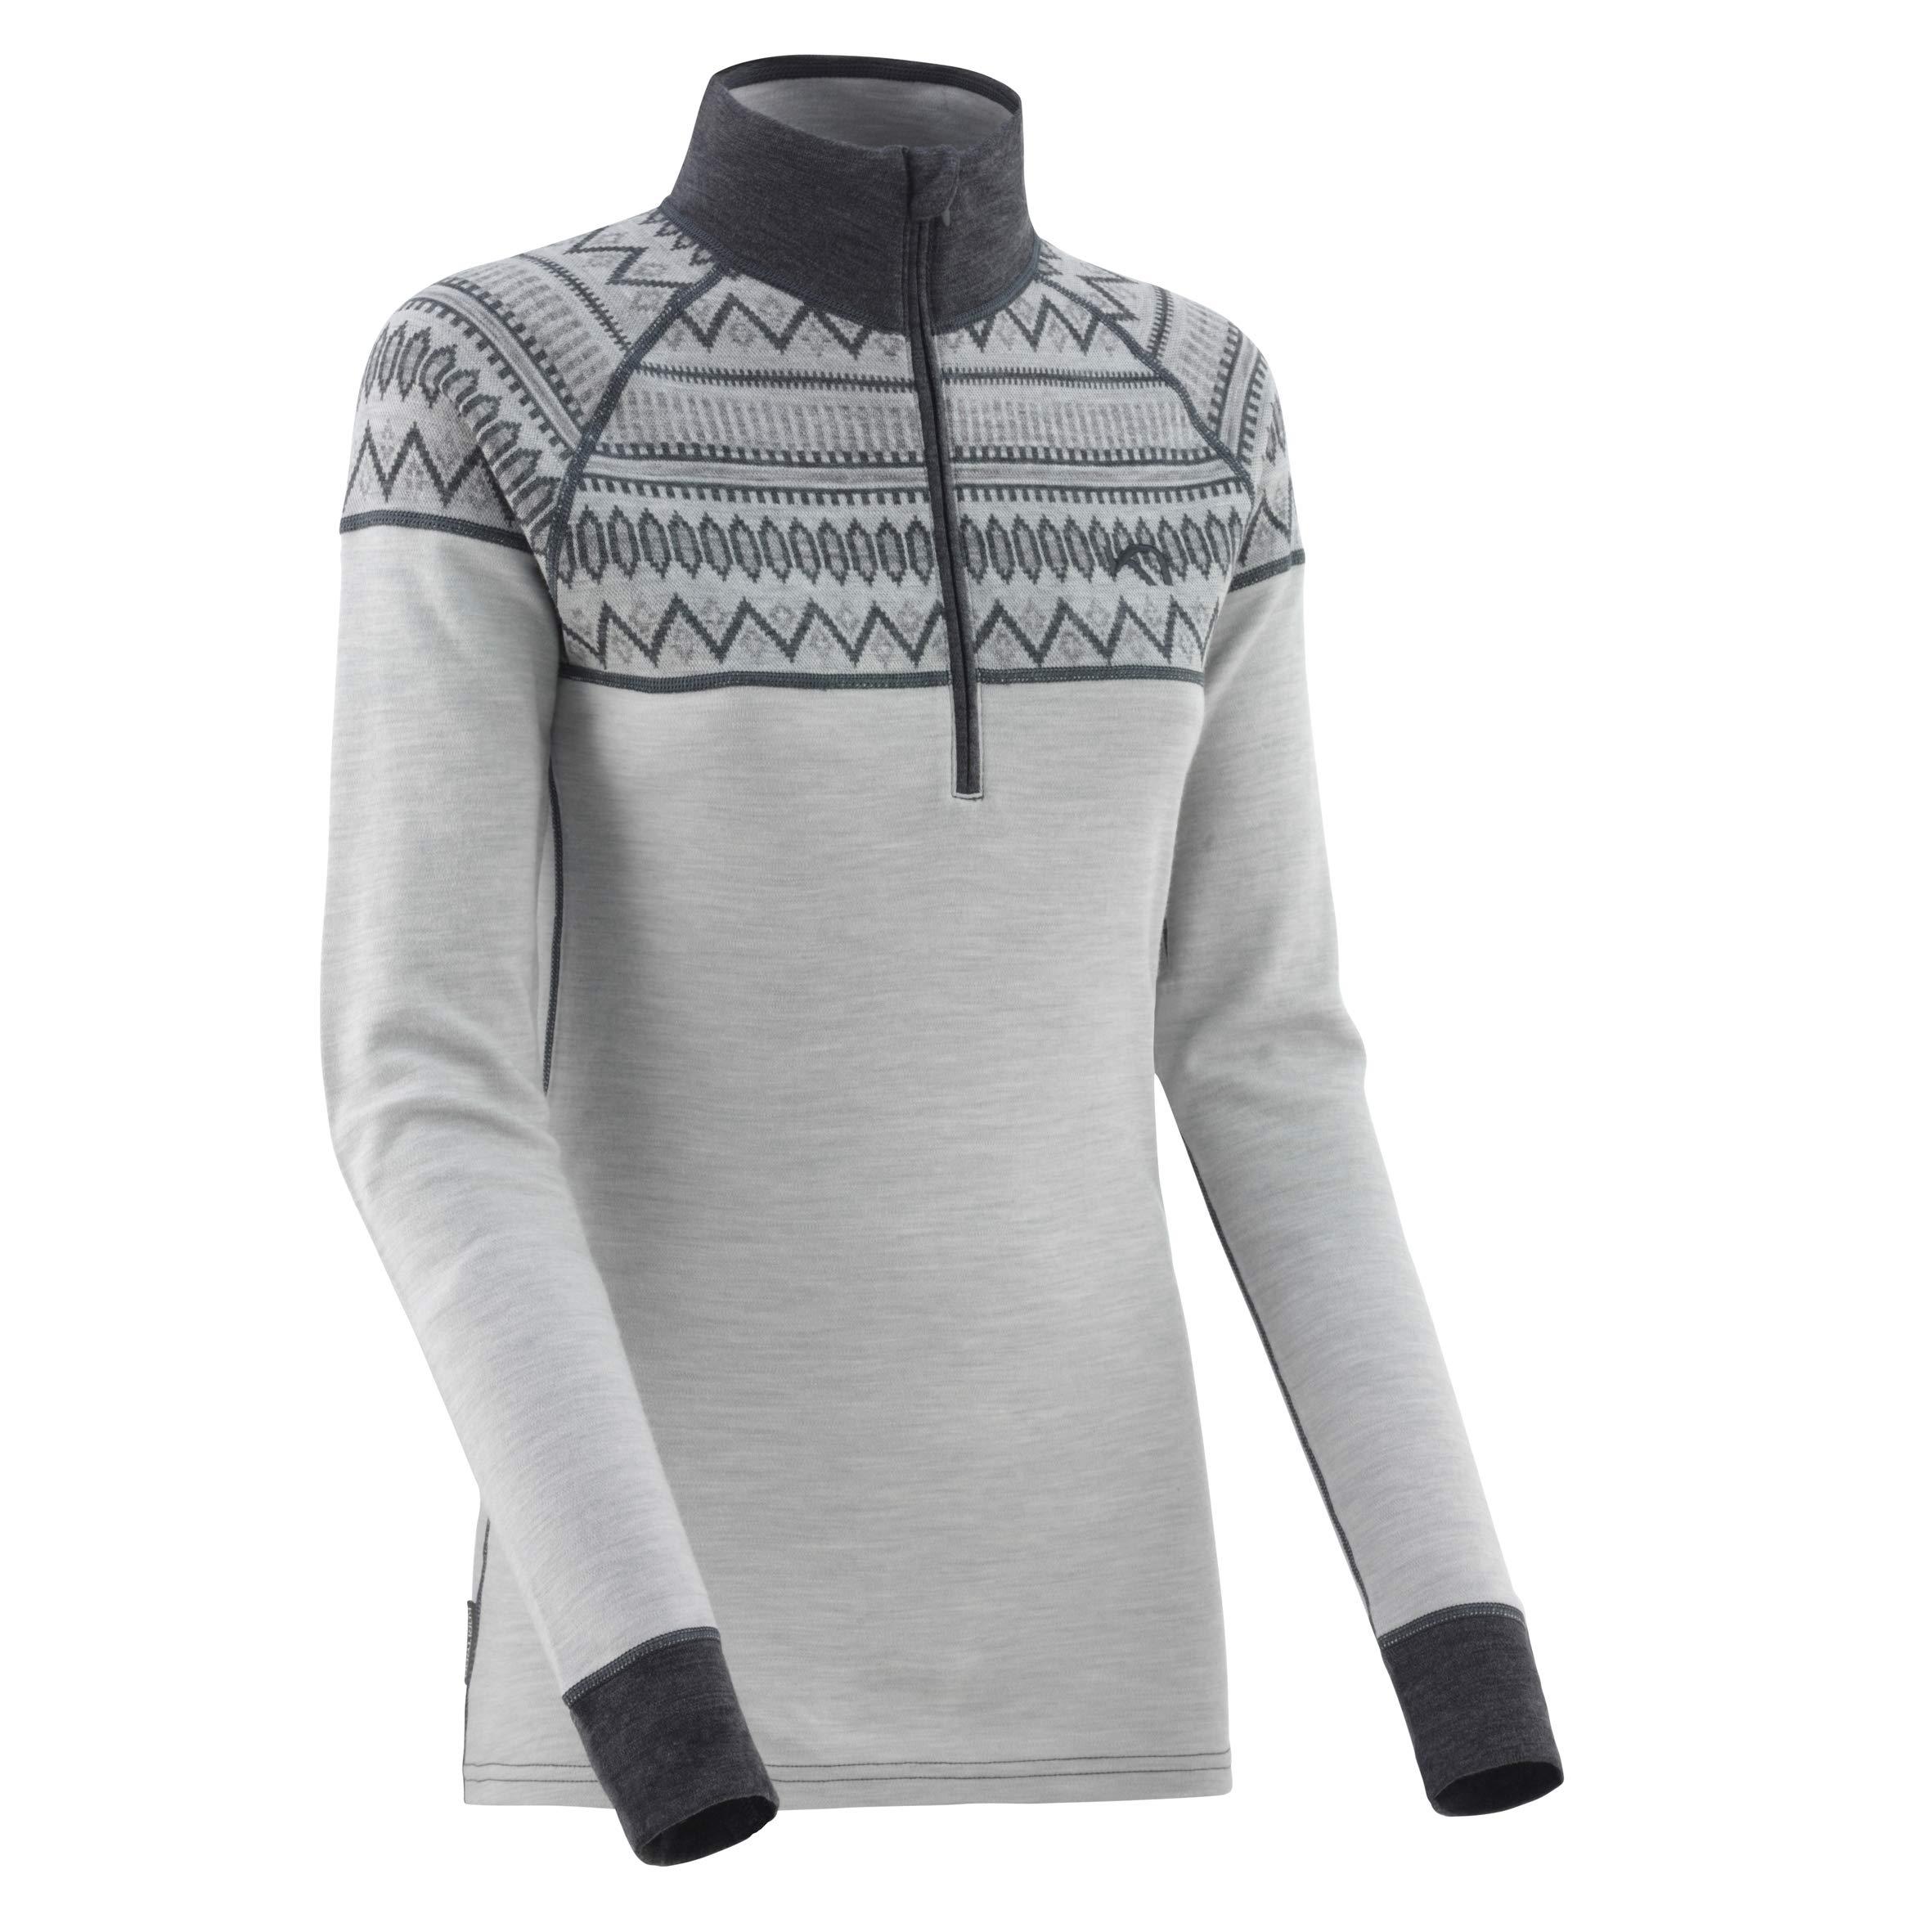 Kari Traa Women's Lokke Base Layer Top - Half Zip 100% Merino Wool Thermal Shirt